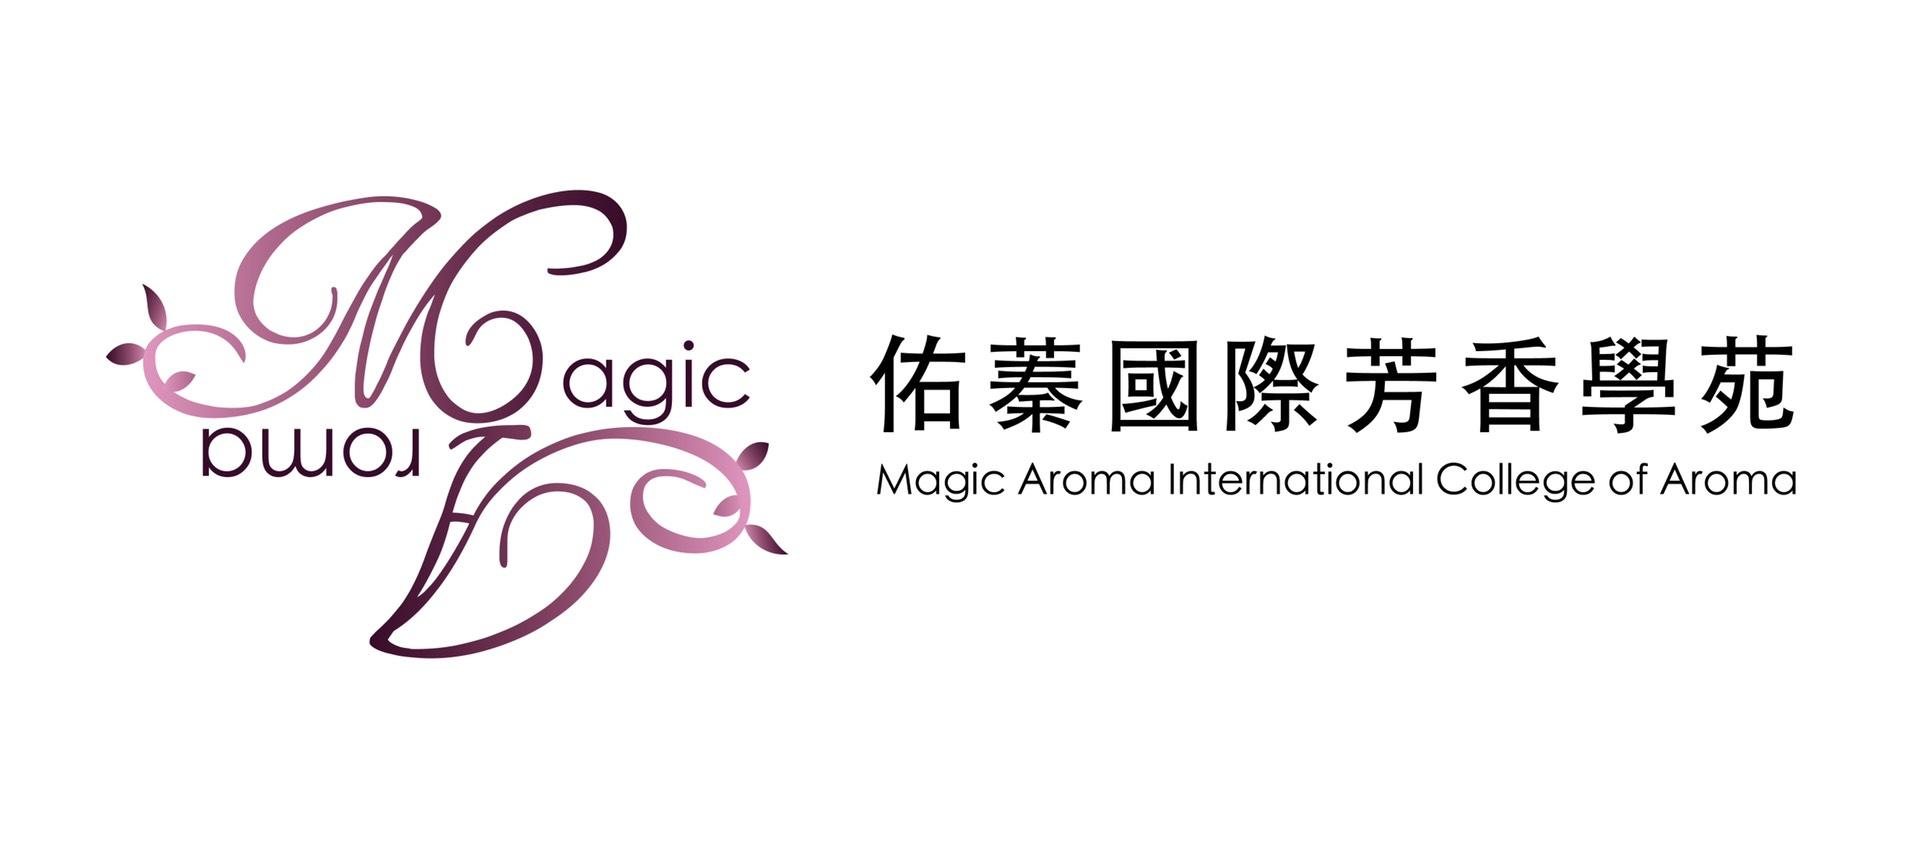 Magic Aroma International College of Aroma